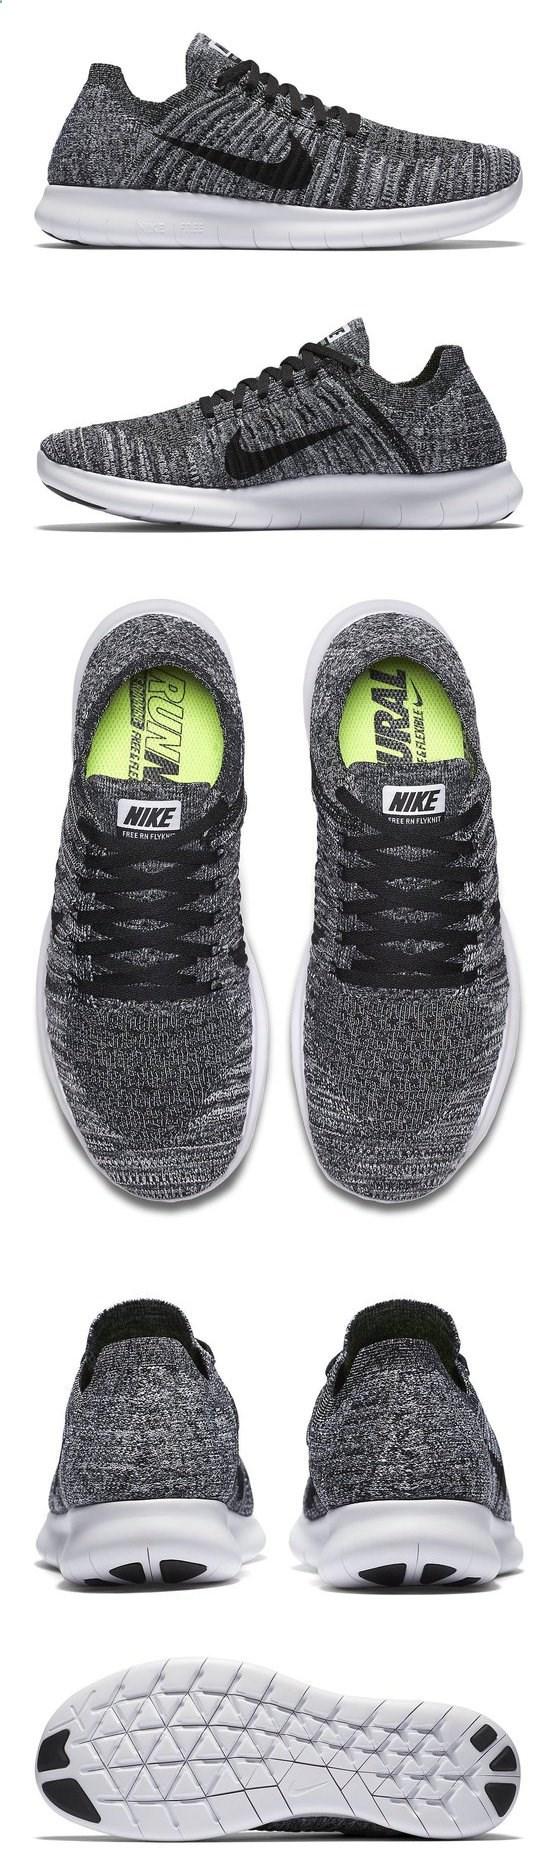 $130 - Nike Women's Free Rn Flyknit Running Shoe White/Black 9 B(M) US #shoes #nike #2016 Clothing, Shoes & Jewelry : Women : Shoes amzn.to/2k0ZSzK